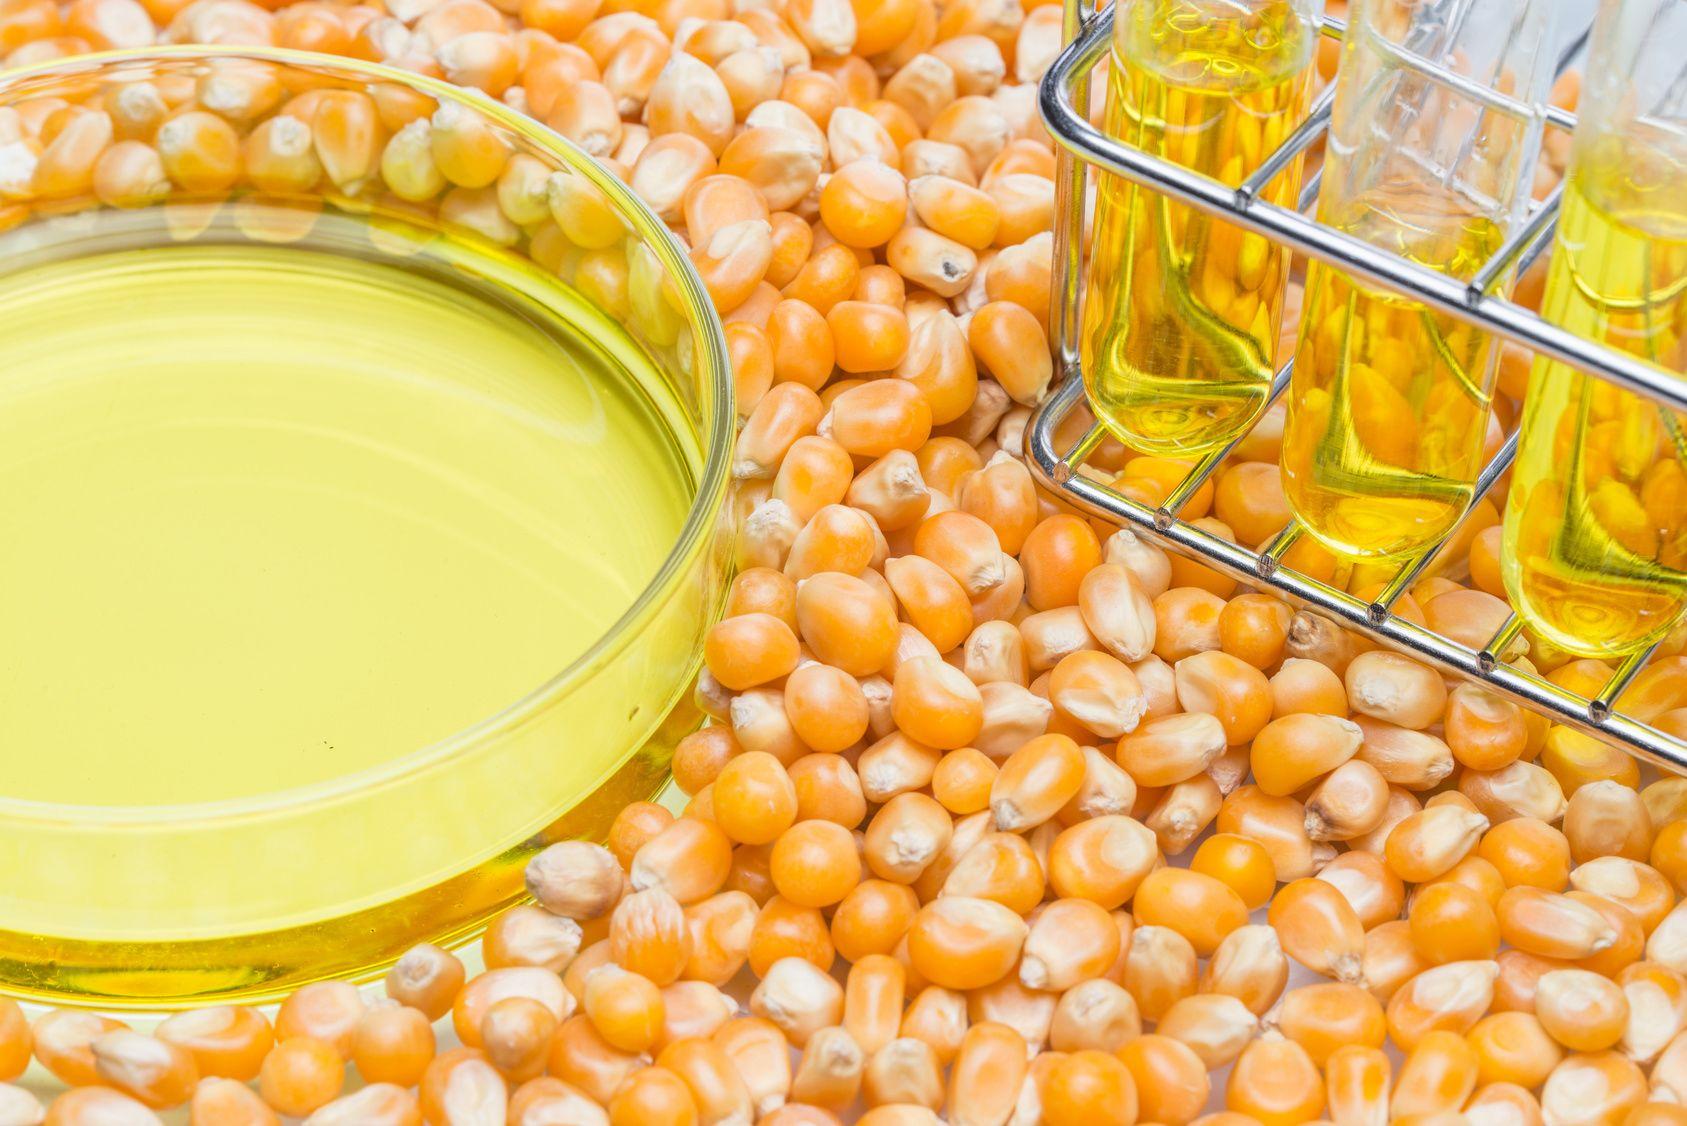 Propanediol An Alternative To Propylene Glycol Propylene Glycol Food Natural Ingredients